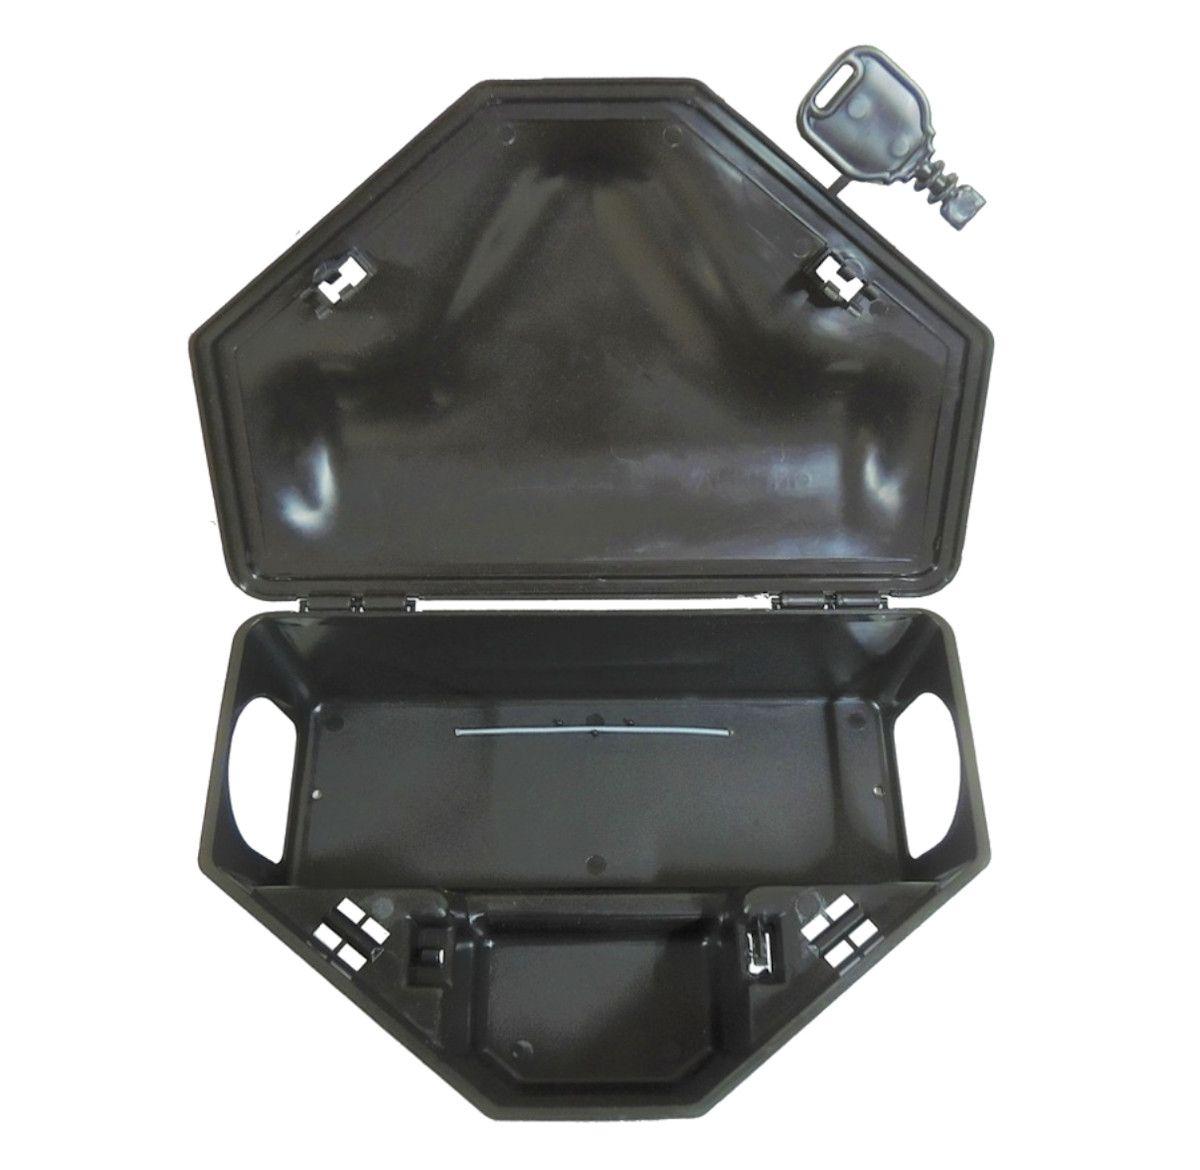 Kit 19 Porta Isca Com 2 Chaves - Duplo Travamento